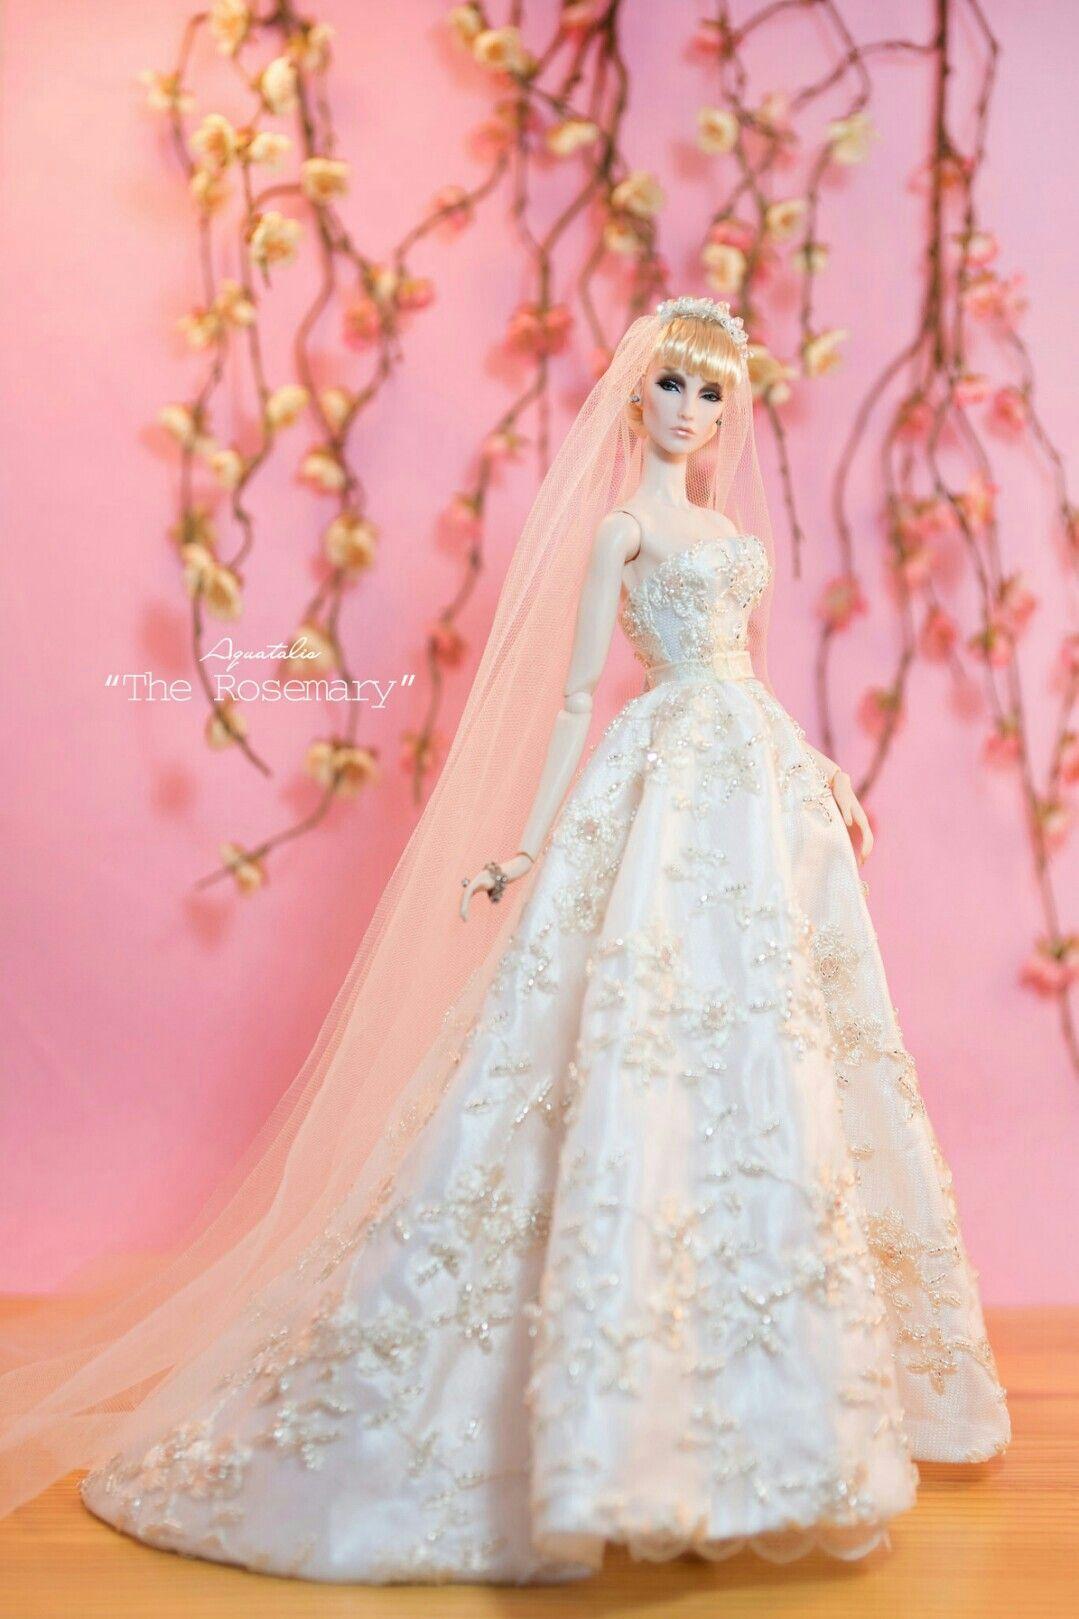 Pin de Wendy Anderson en Dolls | Pinterest | Barbie, Vestido de ...